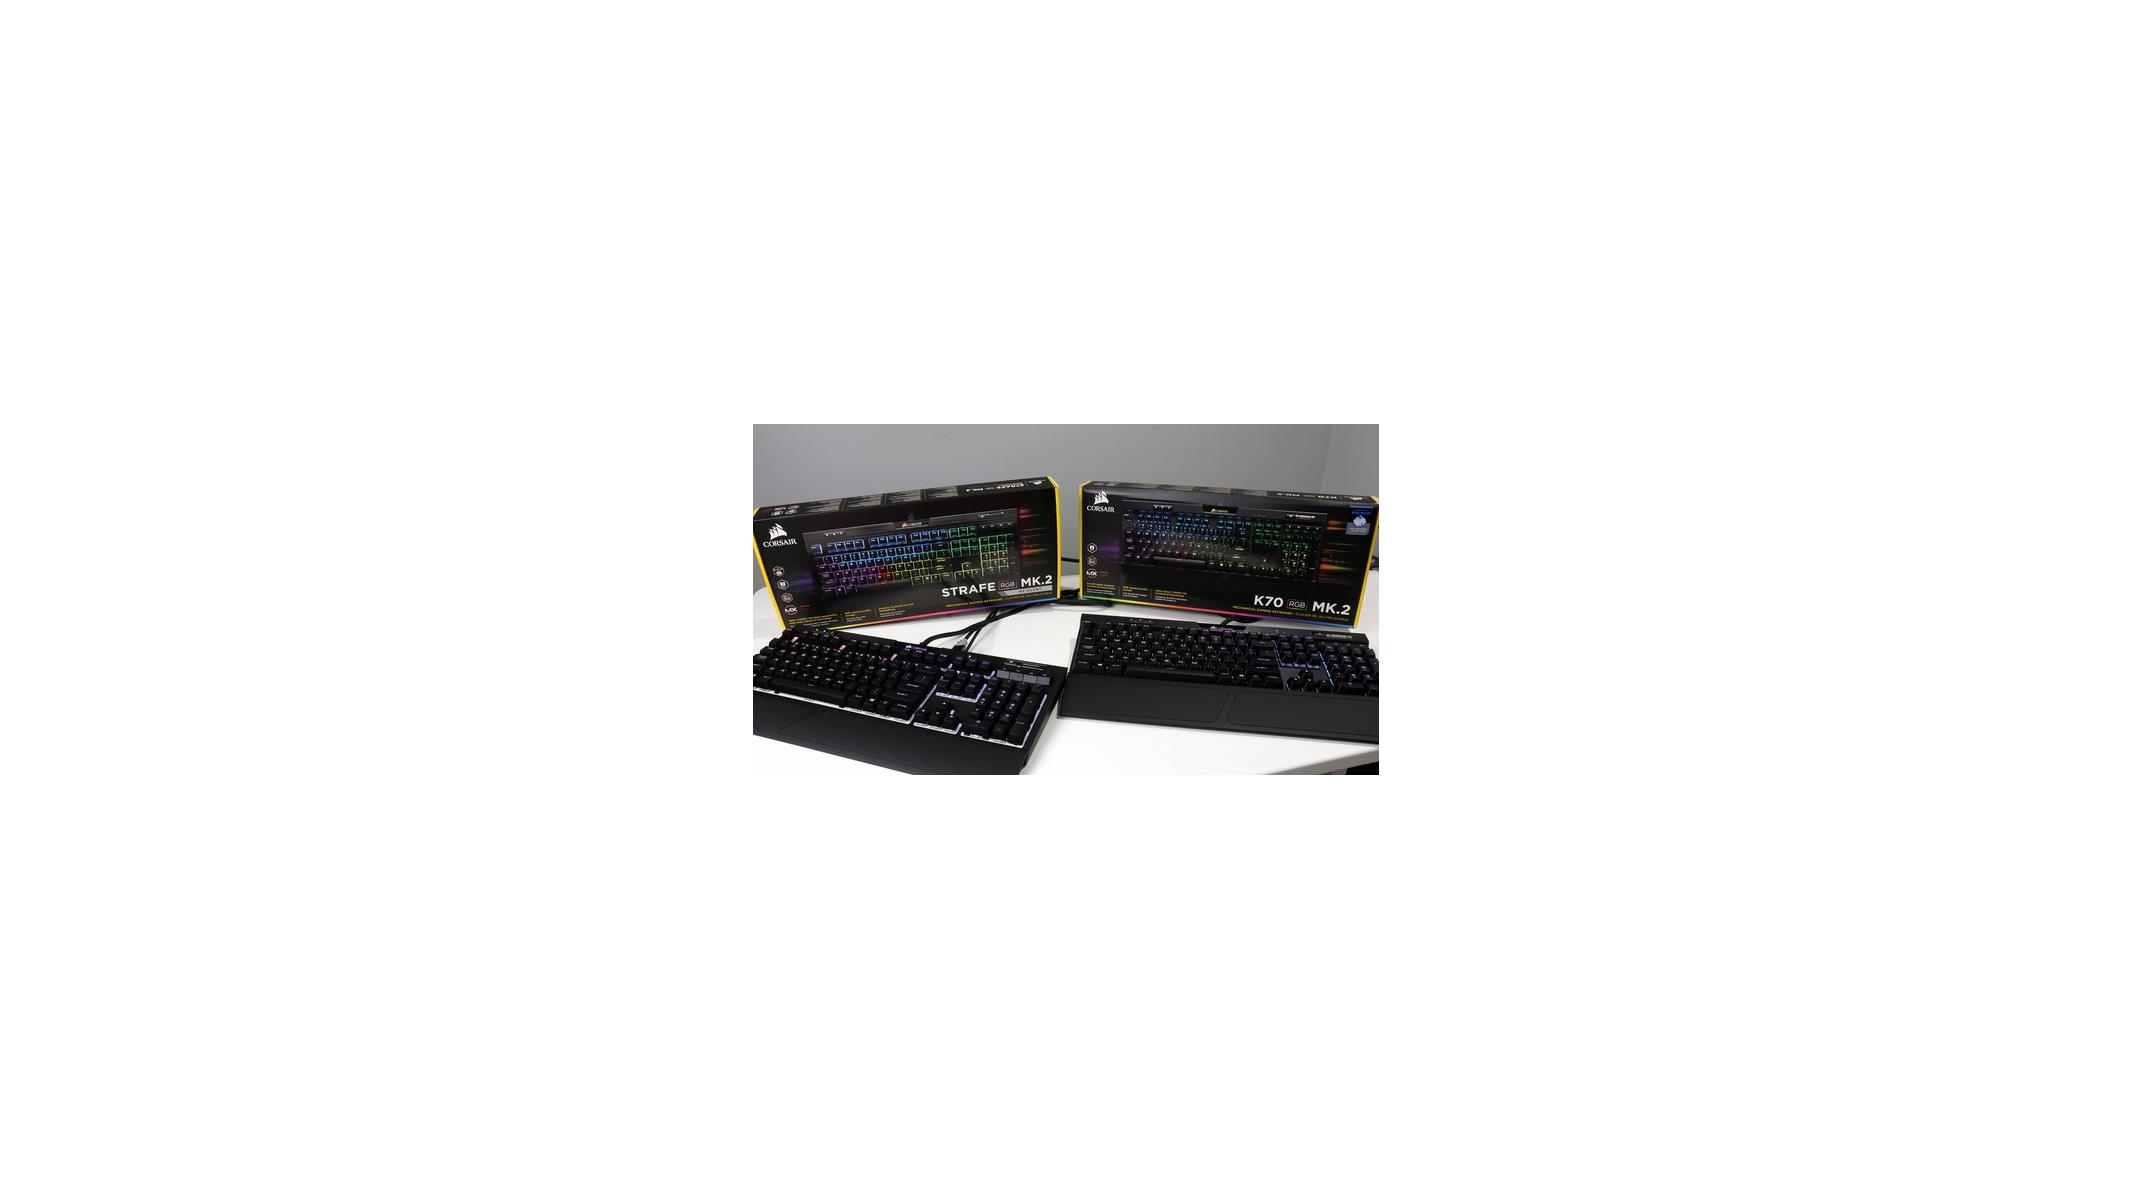 Corsair K70 RGB MK 2 And Strafe RGB MK 2 Gaming Keyboard Review